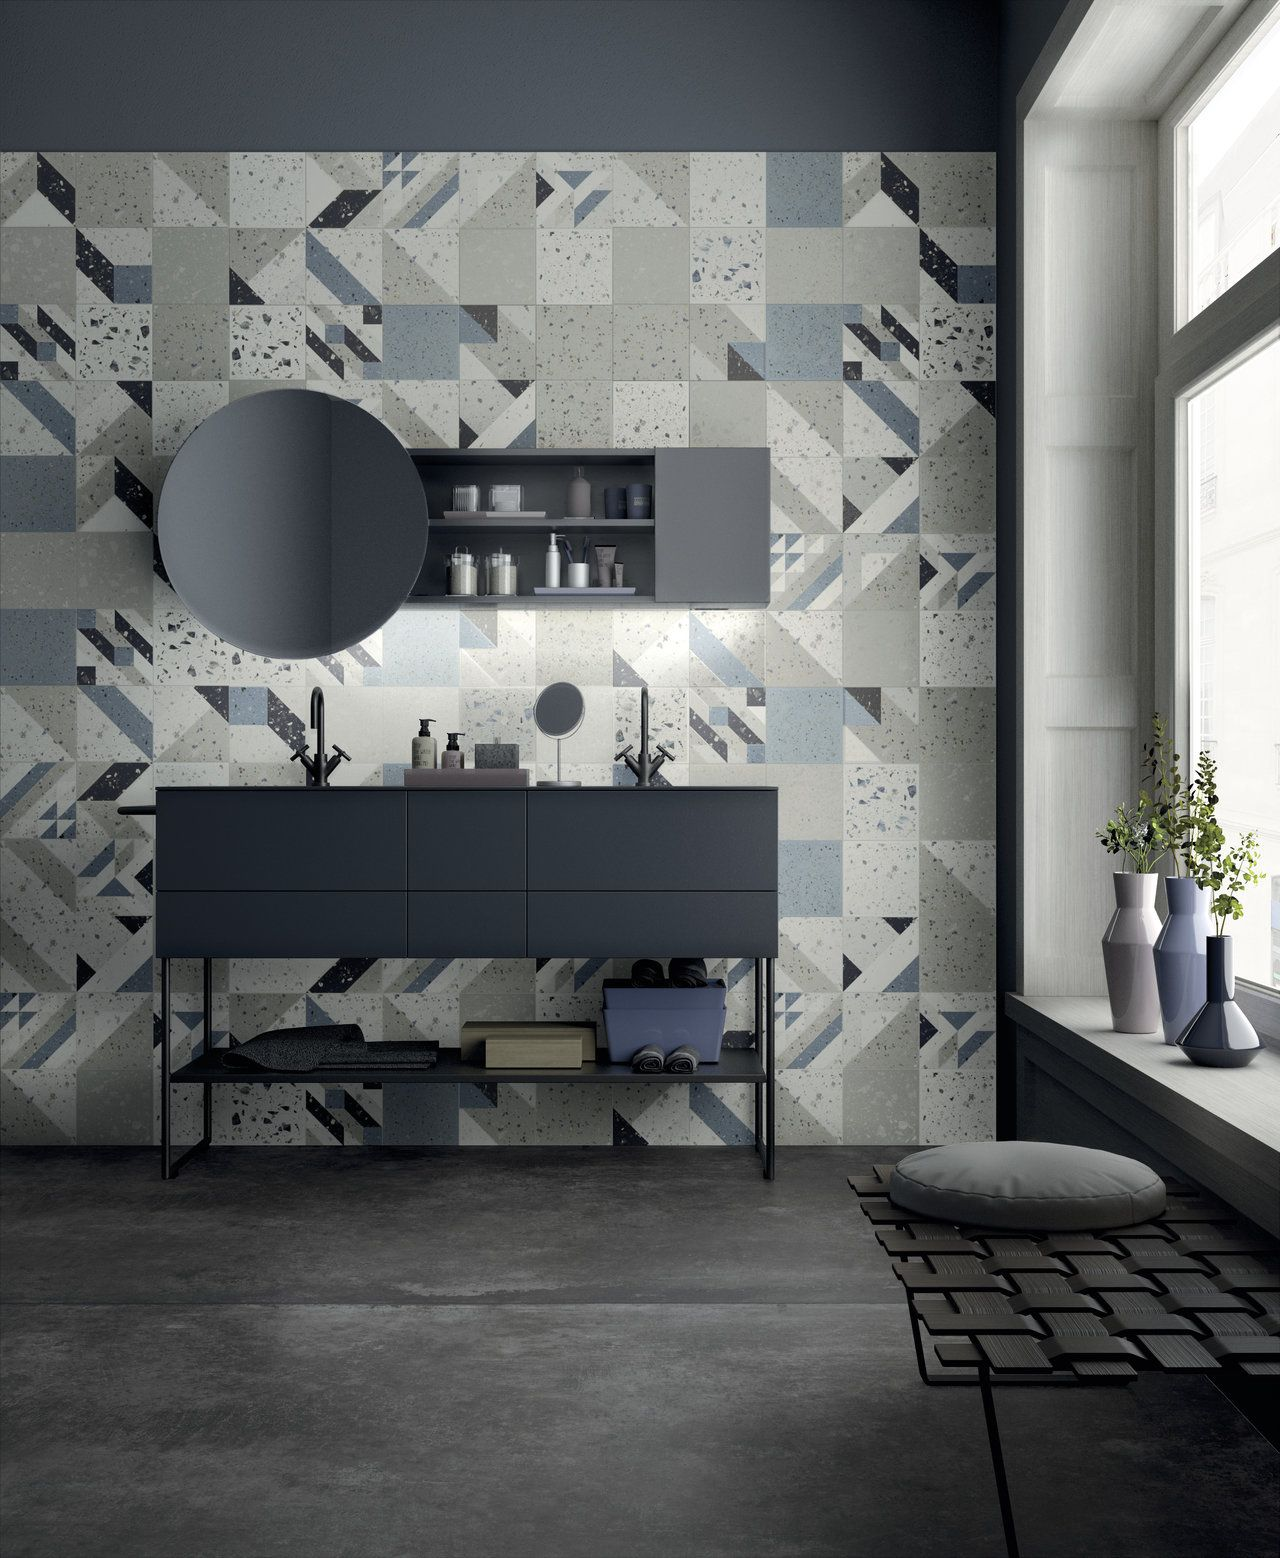 Arqui Cold Custom Made Furniture Tiles Uk Wall Tiles